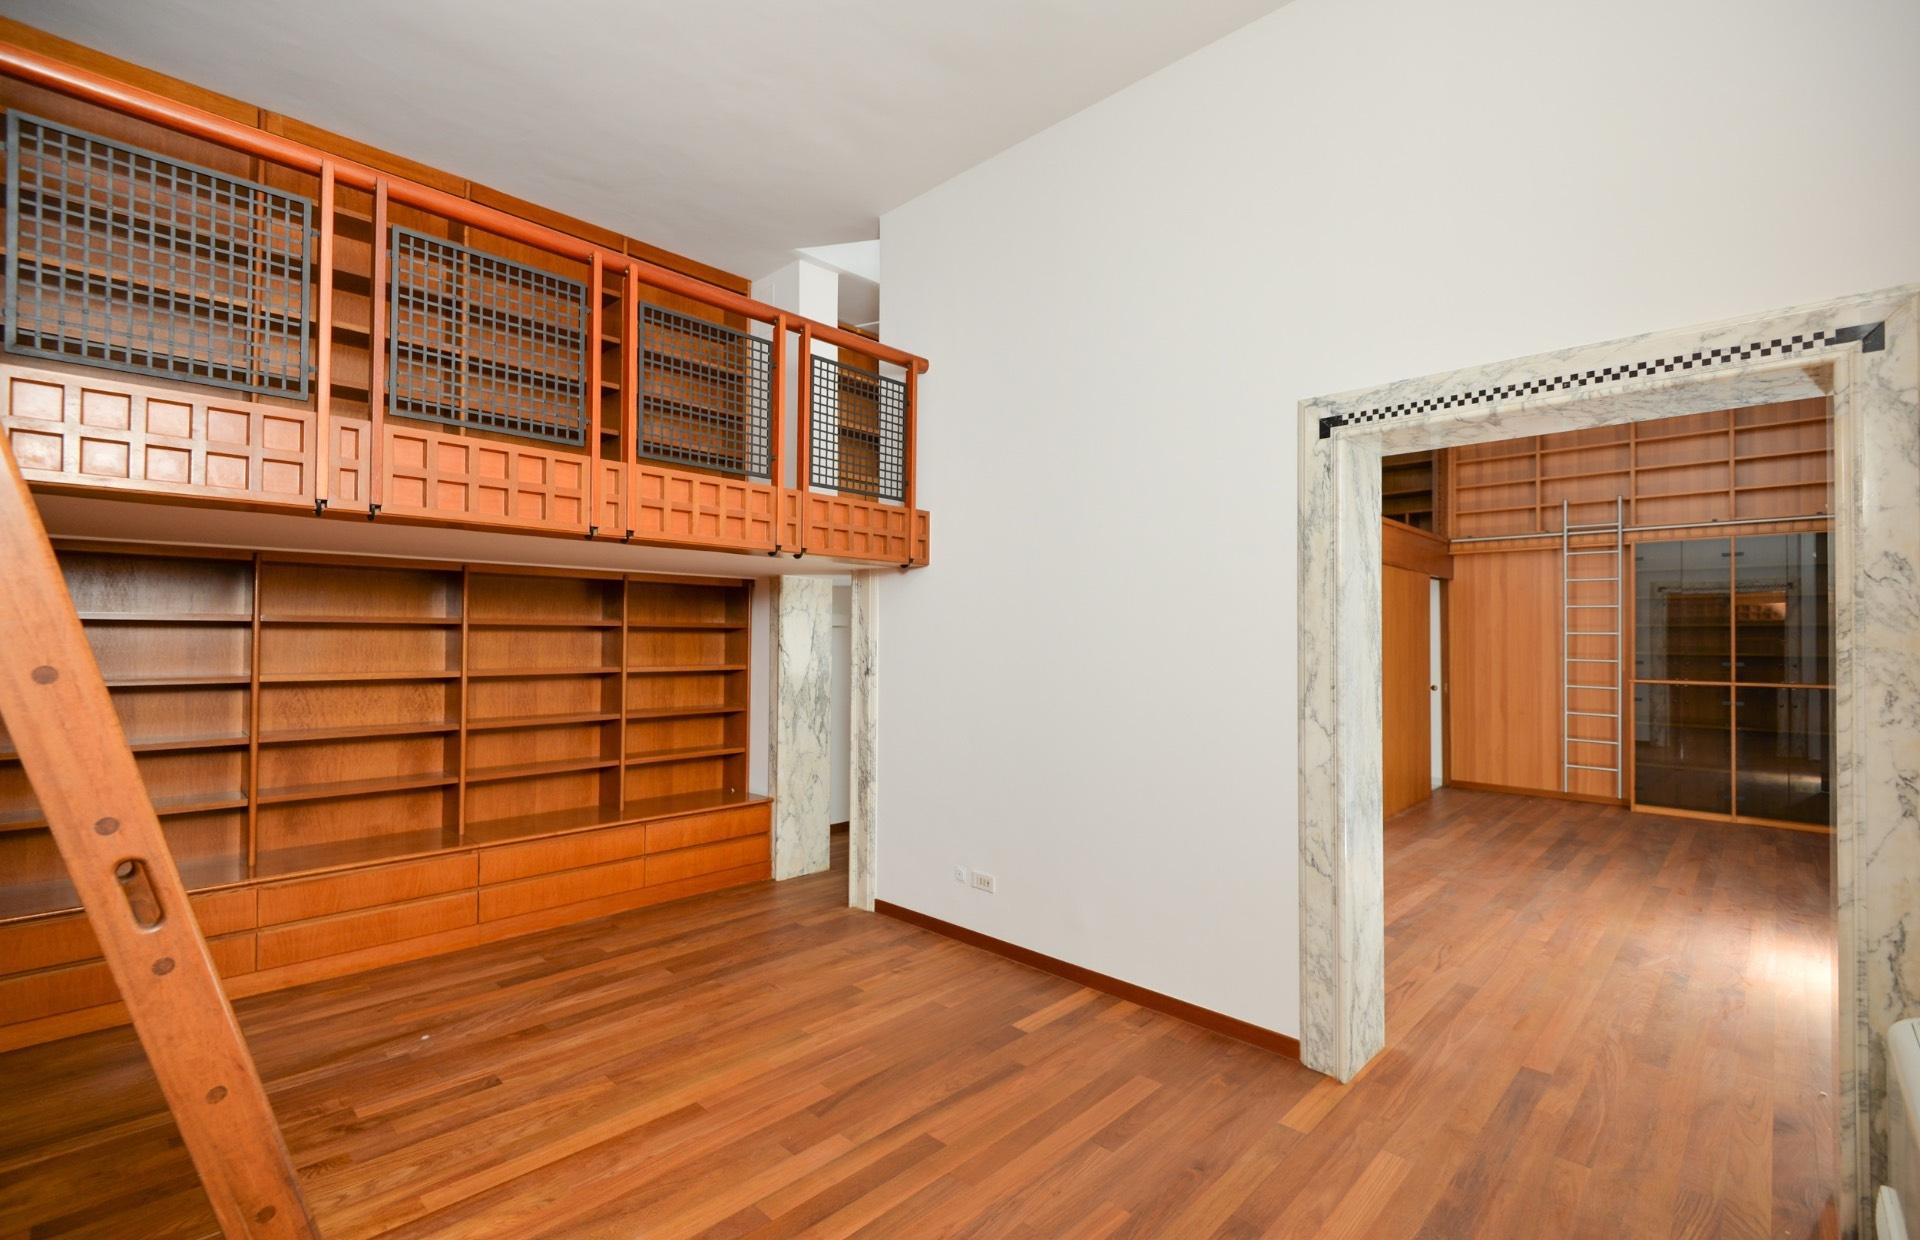 Cbi094 bal002 appartamento in affitto a bari murat for Appartamento in affitto arredato bari